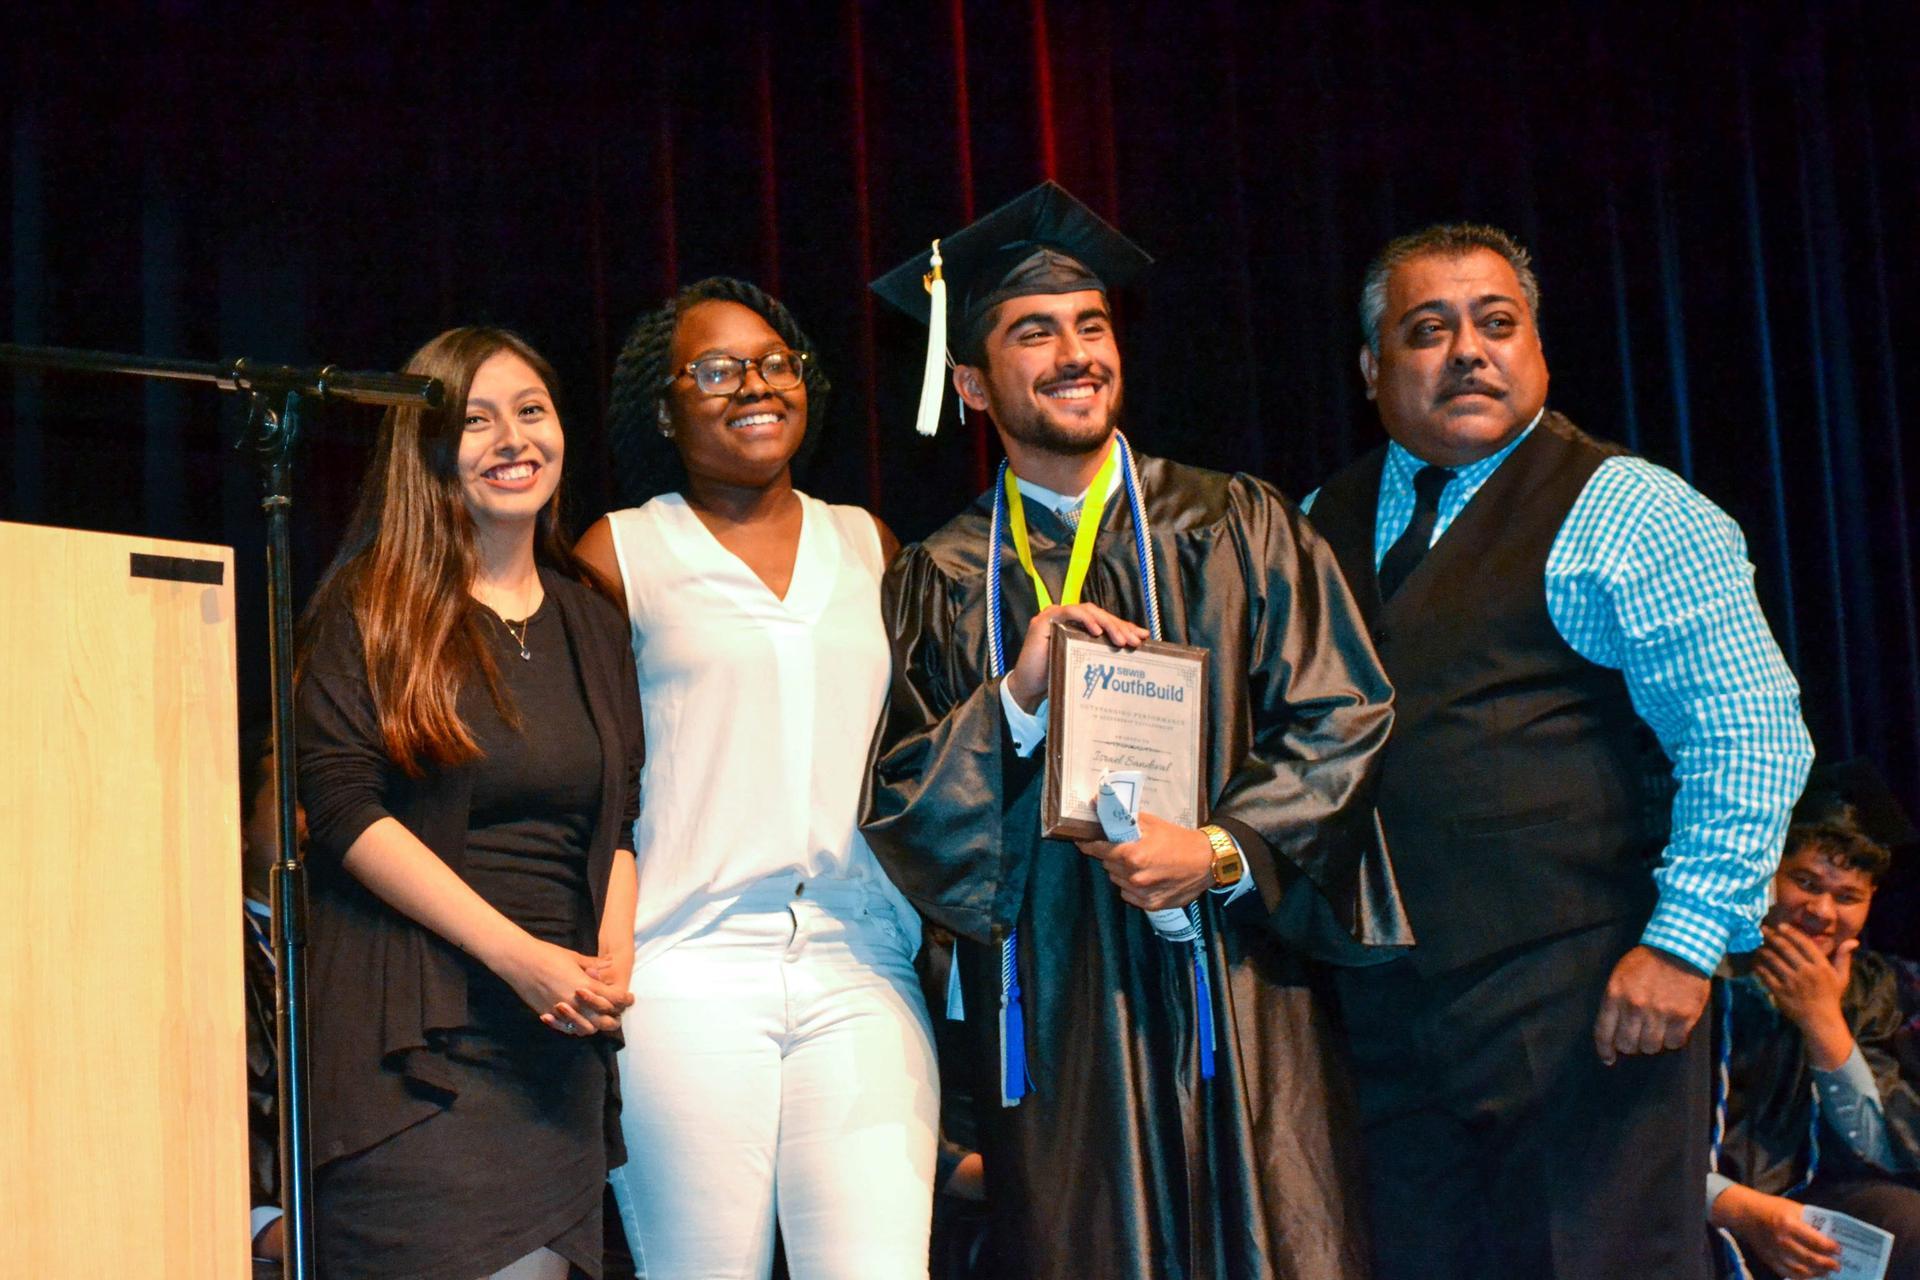 Lennox student wins award at graduation